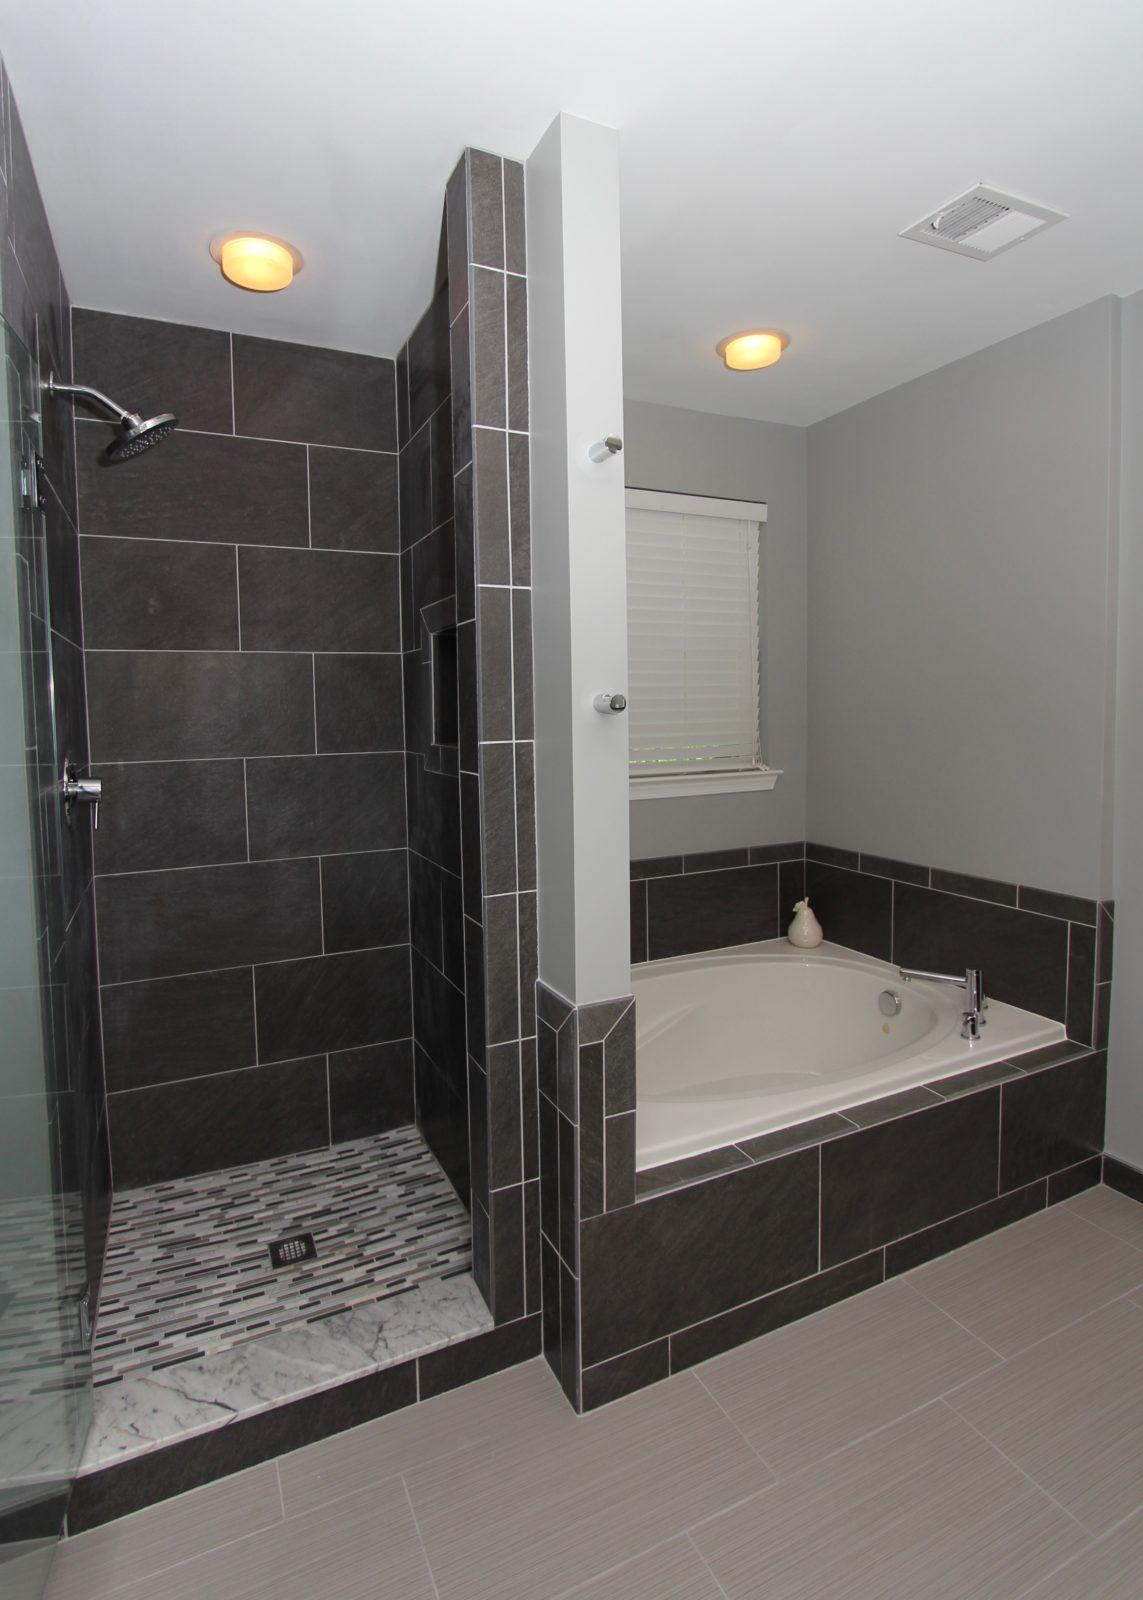 bel air charcoal tiled bathroom i